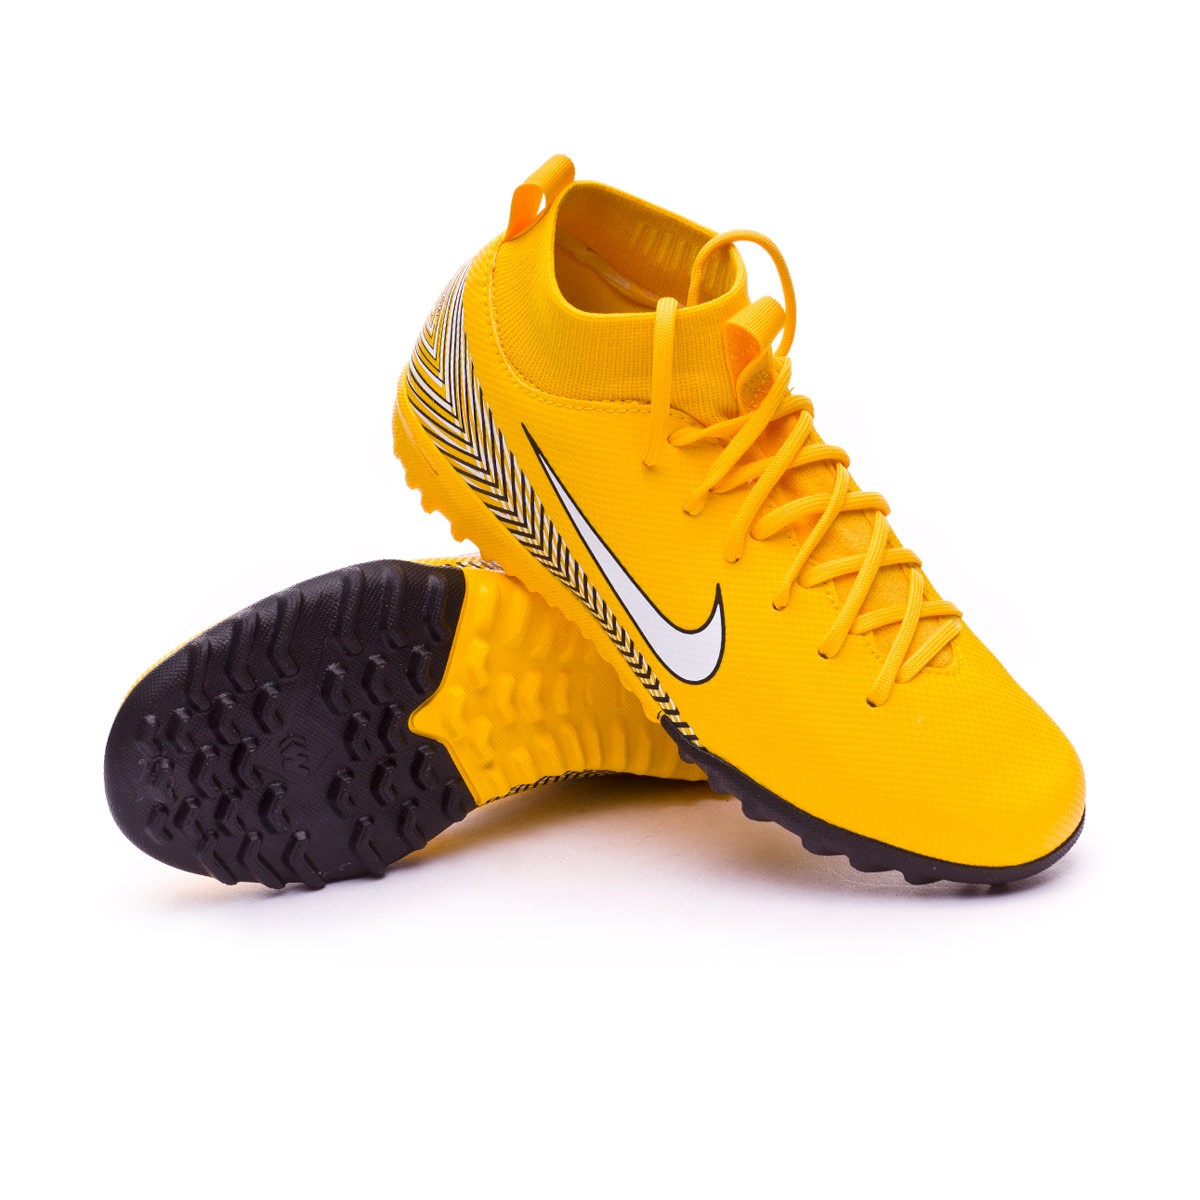 5278dd2a33d ... order football boot nike kids mercurial superflyx vi academy turf  neymar 386c2 3ec29